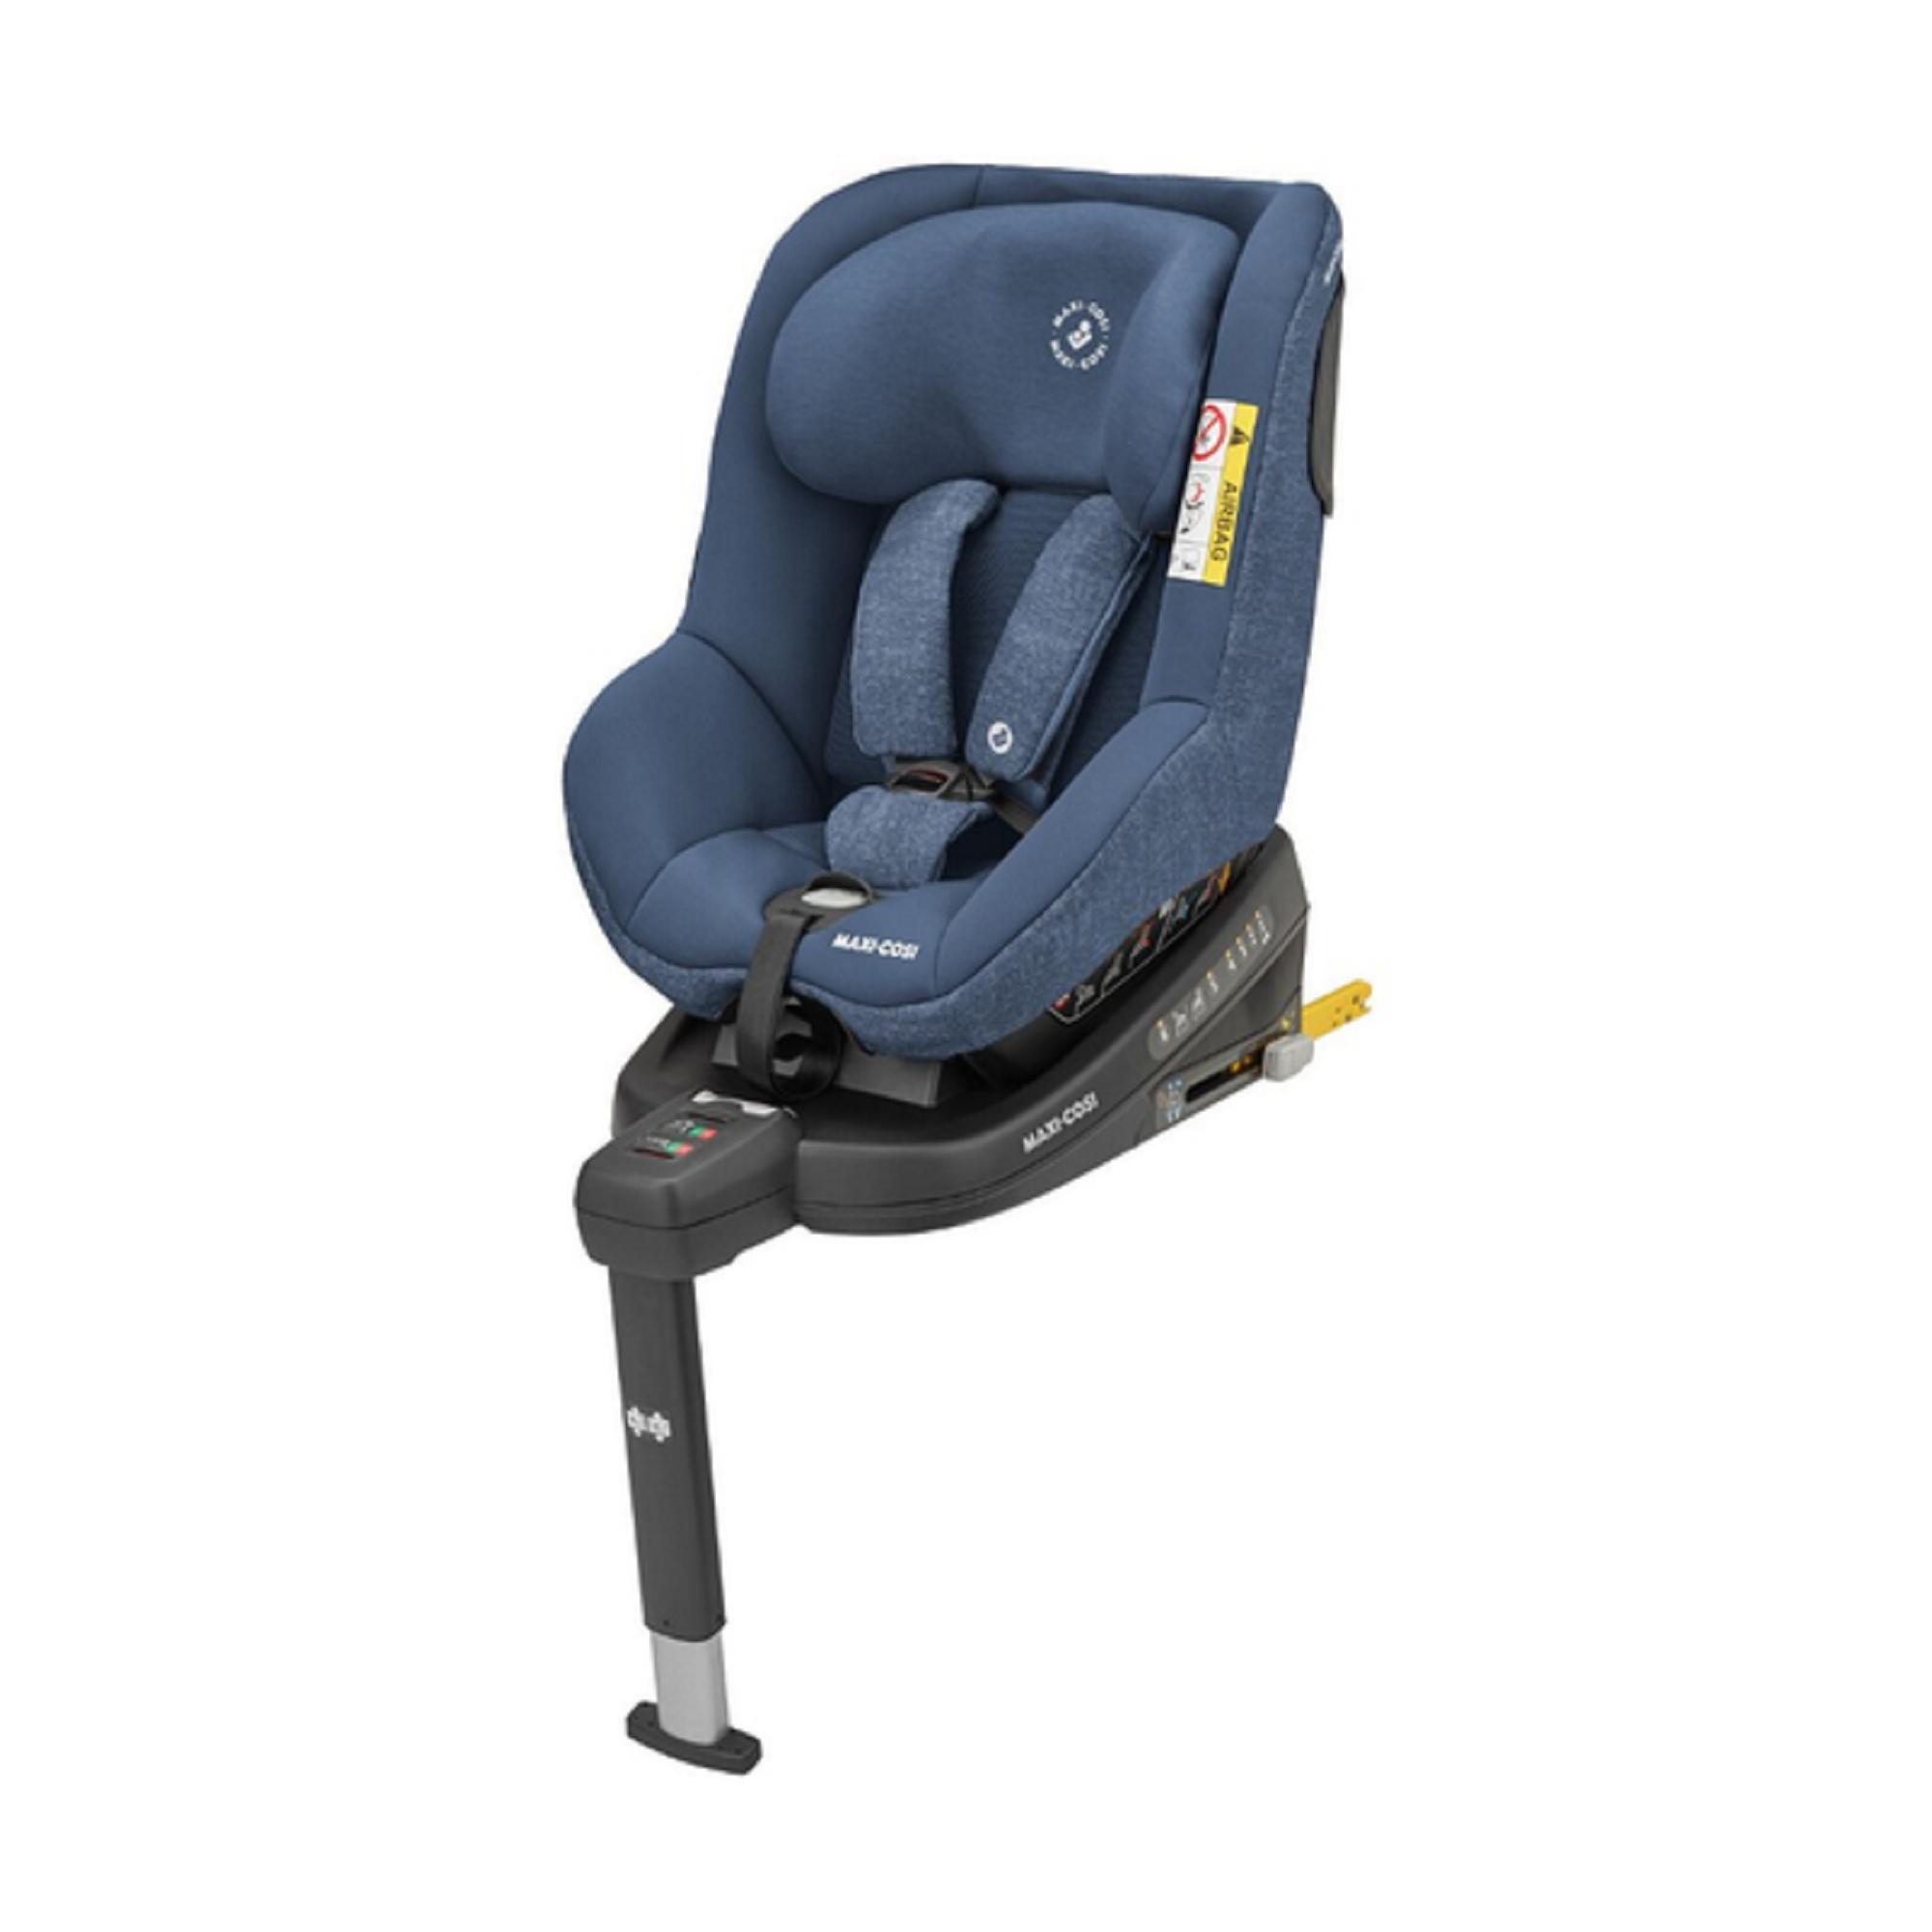 MAXI COSI Κάθισμα Αυτοκινήτου Maxi Cosi Beryl Nomad Blue